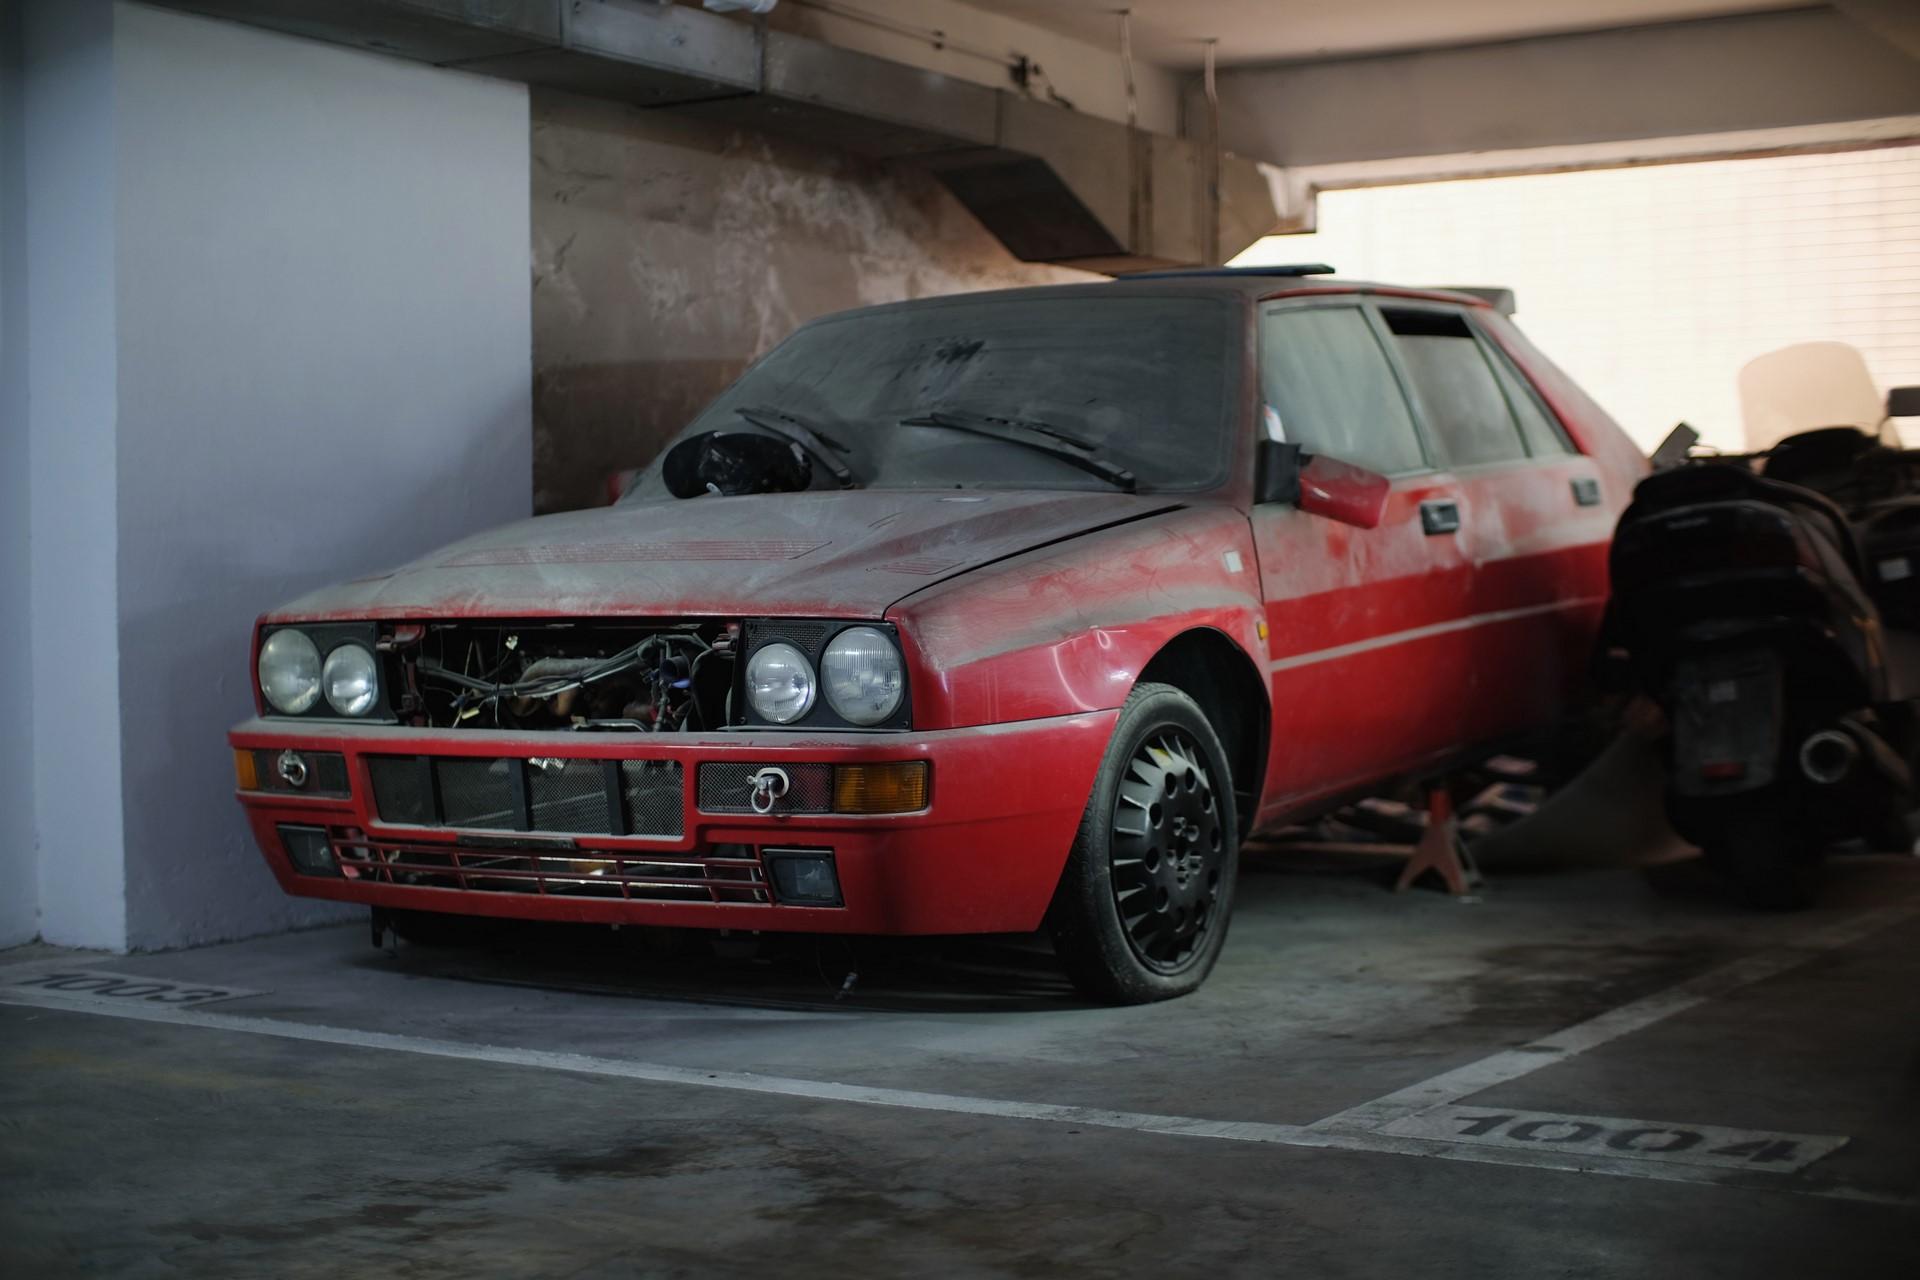 Lancia Delta HF Integrale Evoluzione hong kong (1)